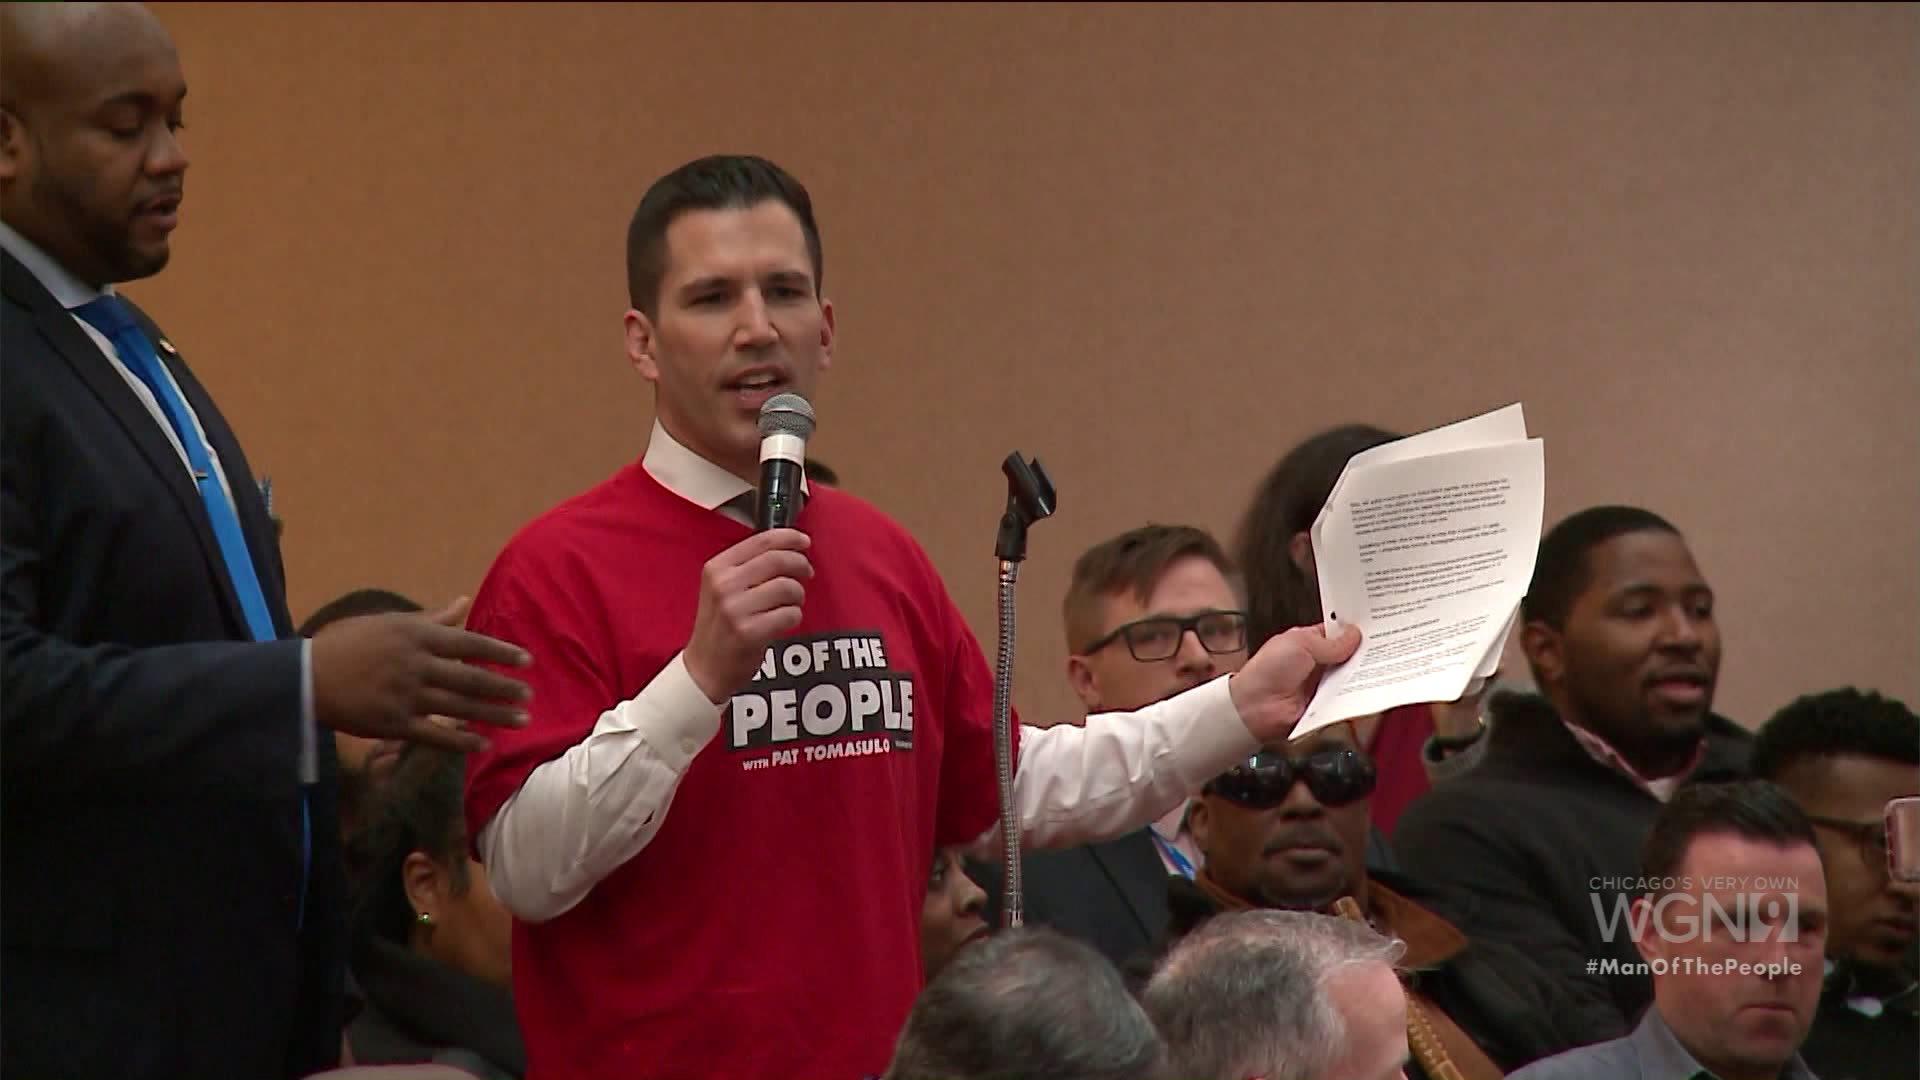 Pat Tomasulo Crashes Chicago City Council Meeting